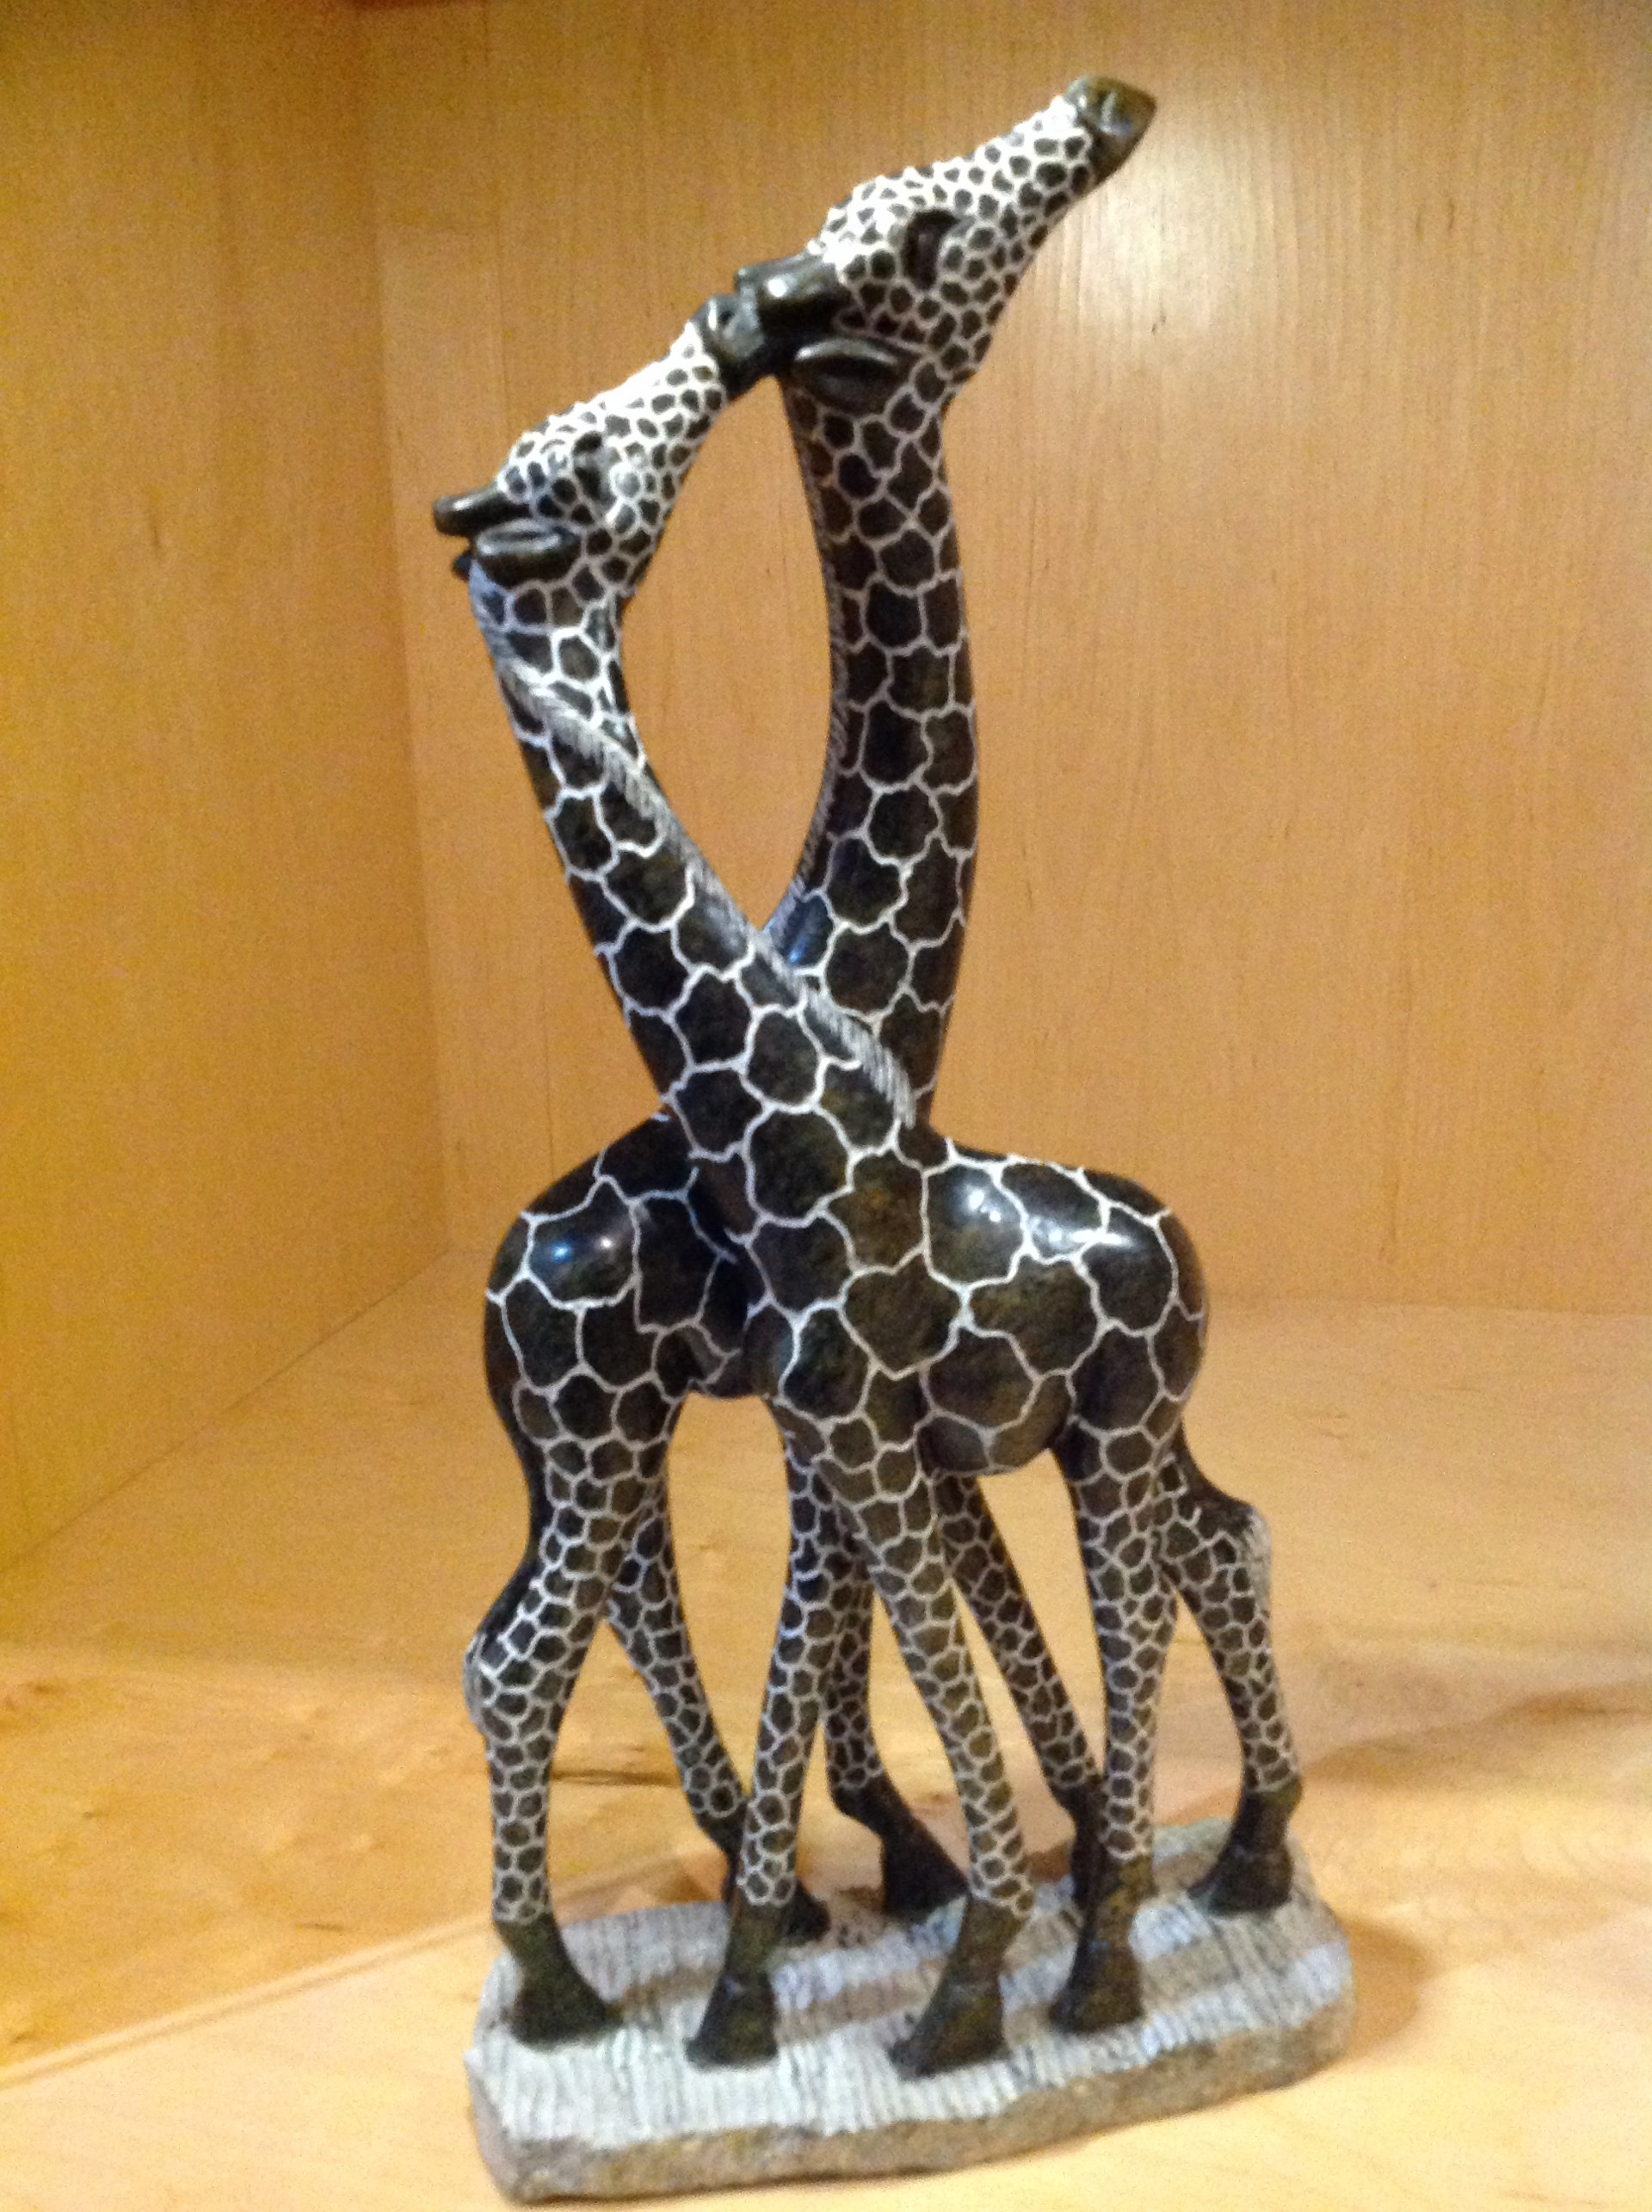 """Kissing Giraffes by Stone Of Shona Lloyd Ngwaru"